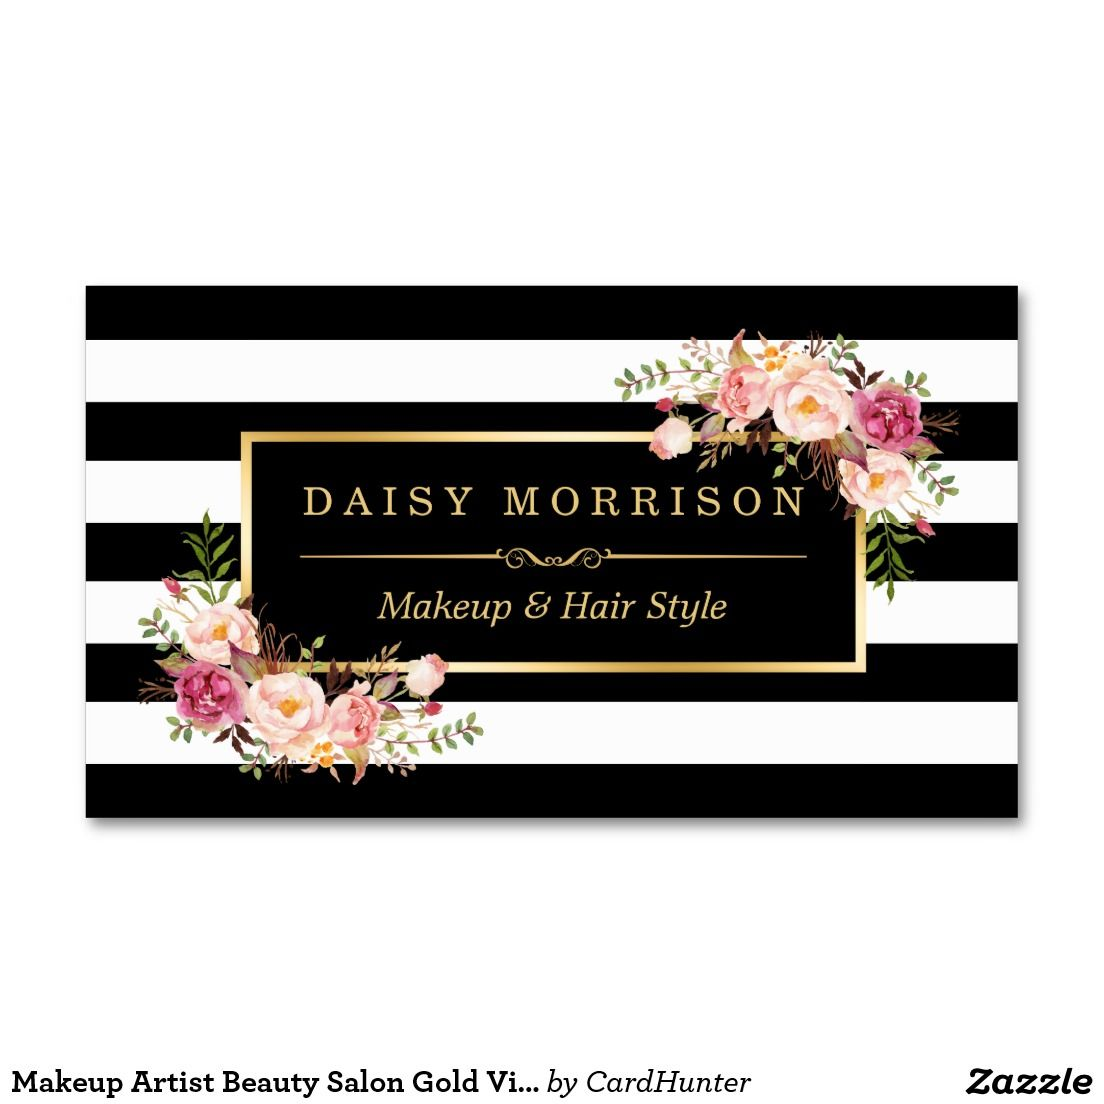 Makeup artist beauty salon gold vintage floral business card makeup artist beauty salon gold vintage floral business card reheart Image collections